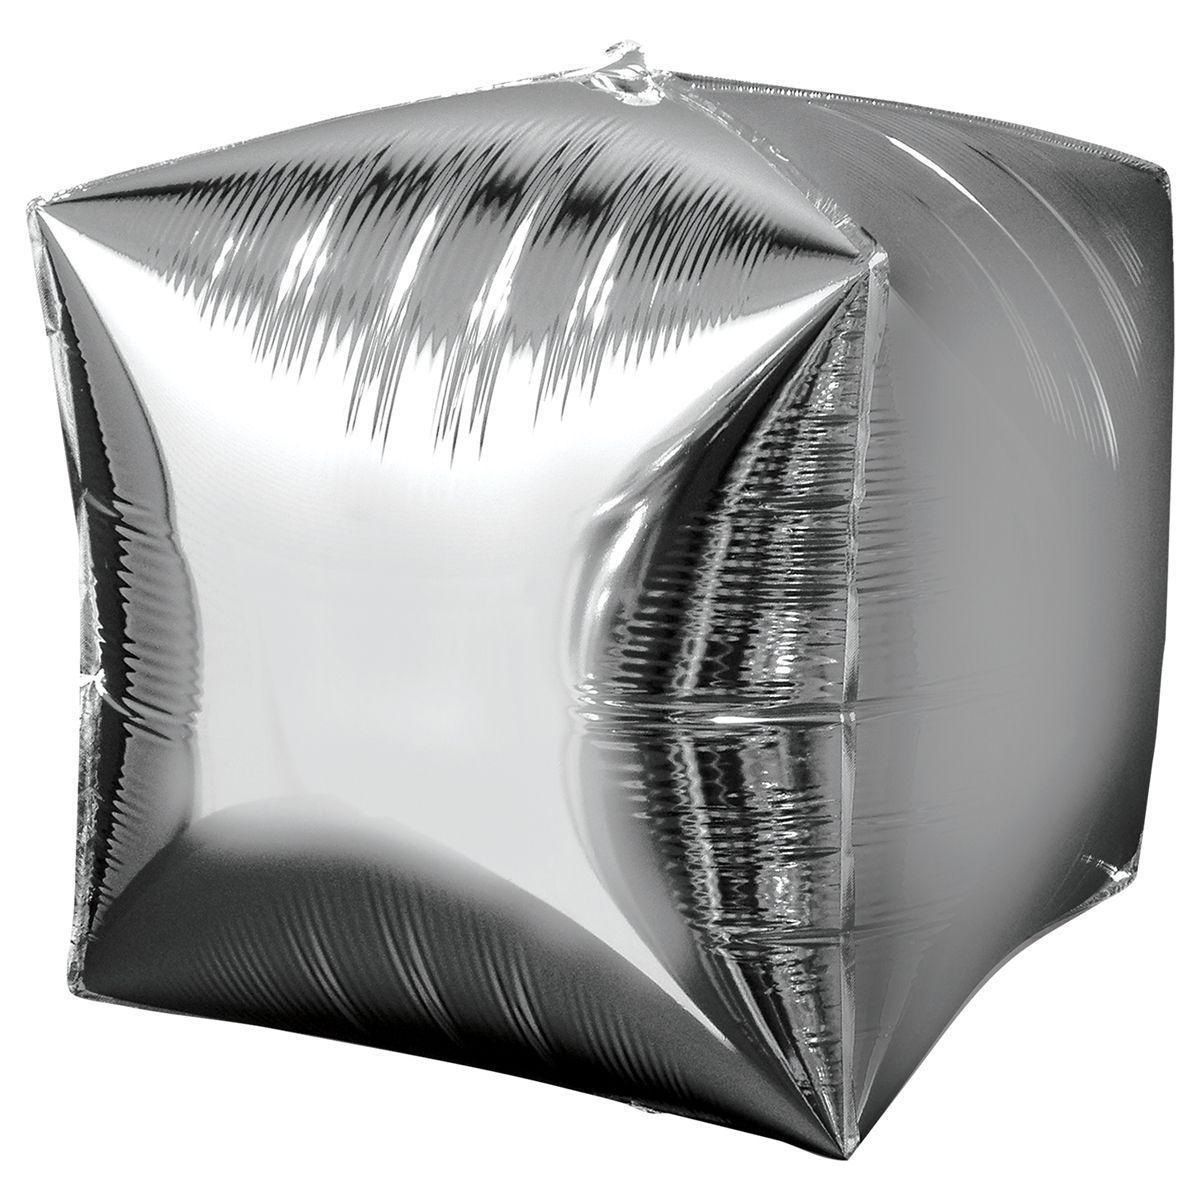 Шары 3D Шар Куб Металлик Silver _15_брис_металлик_silver_c3bc76377d1716f0836aeda9a1db8e39_HD.jpg